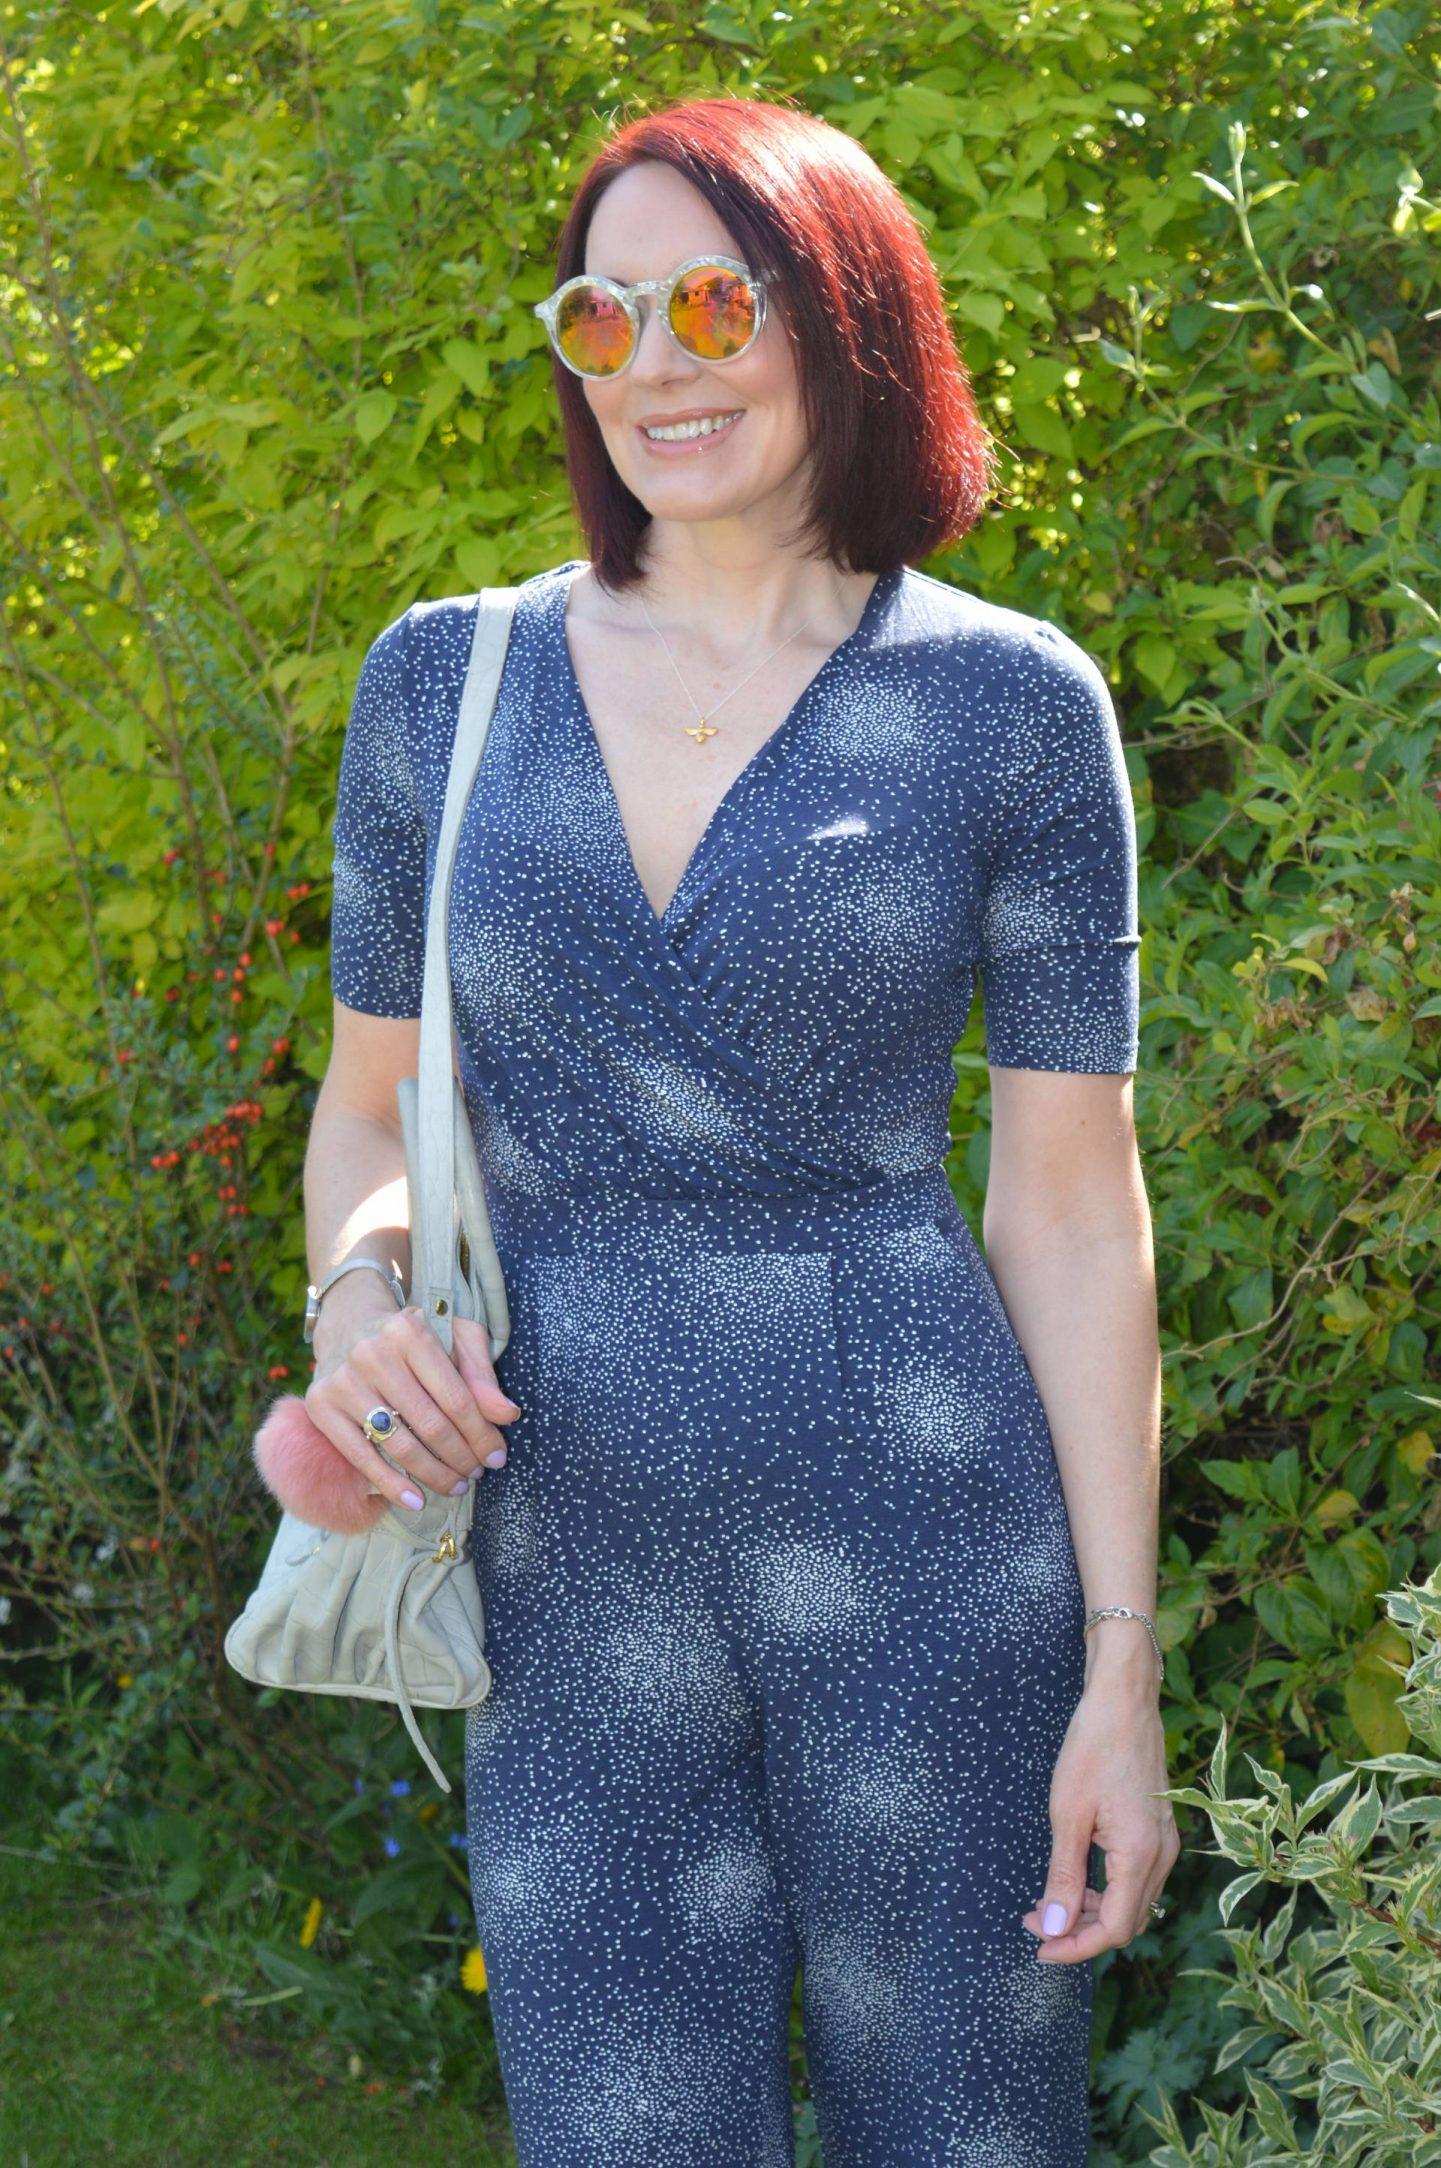 Laura Ashley jumpsuit, Skinny Dip mirrored sunglasses